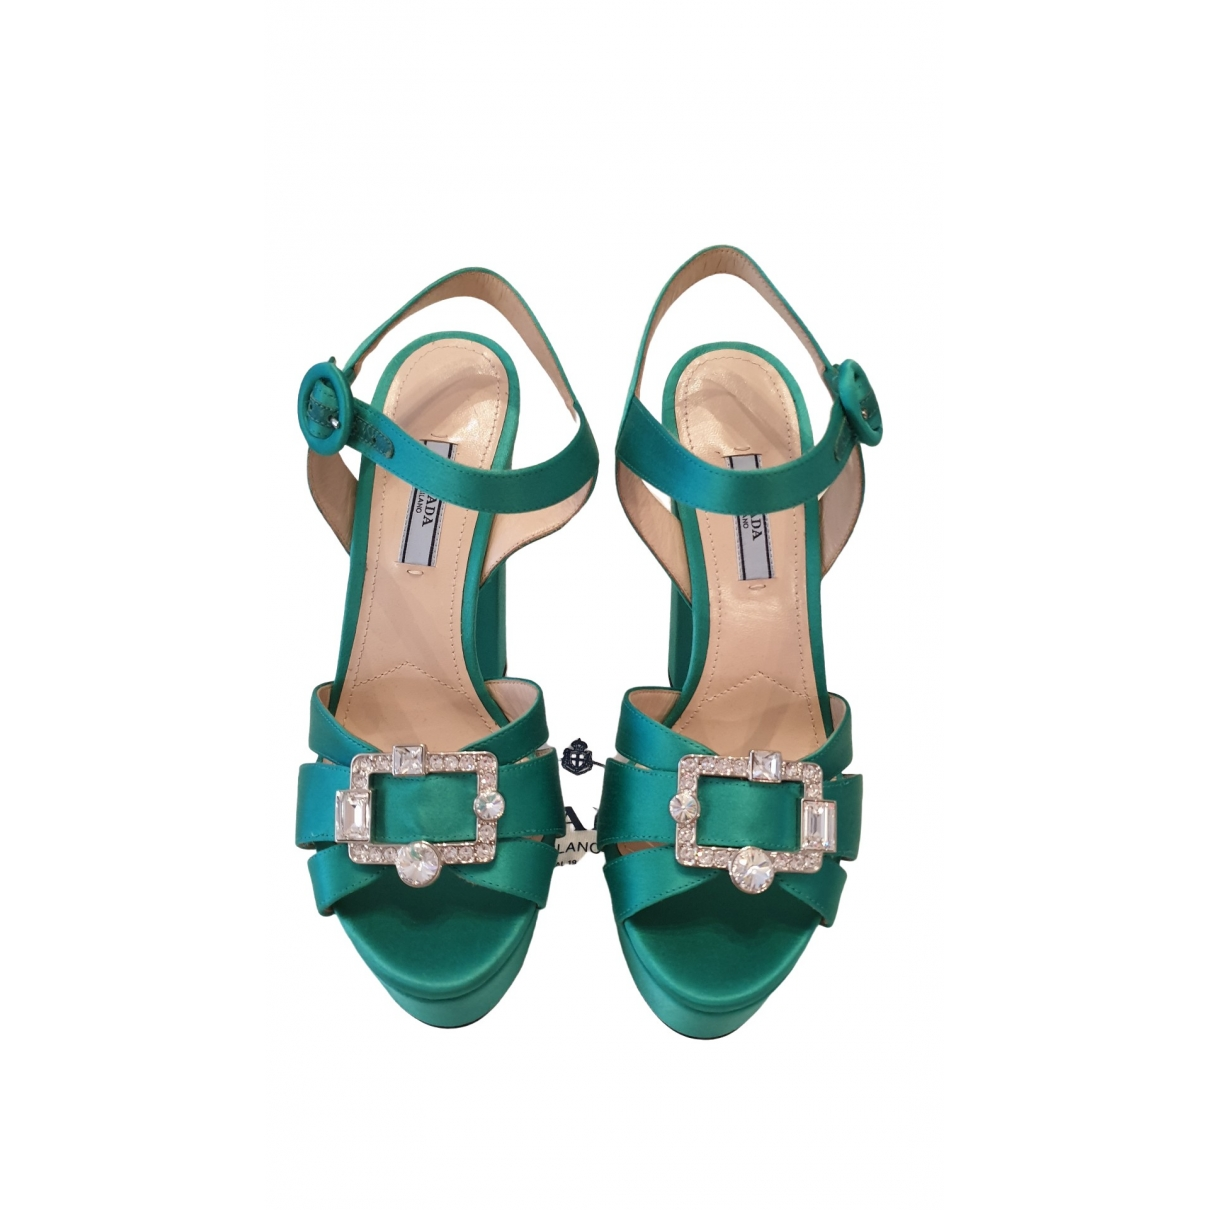 Prada - Sandales   pour femme en suede - vert